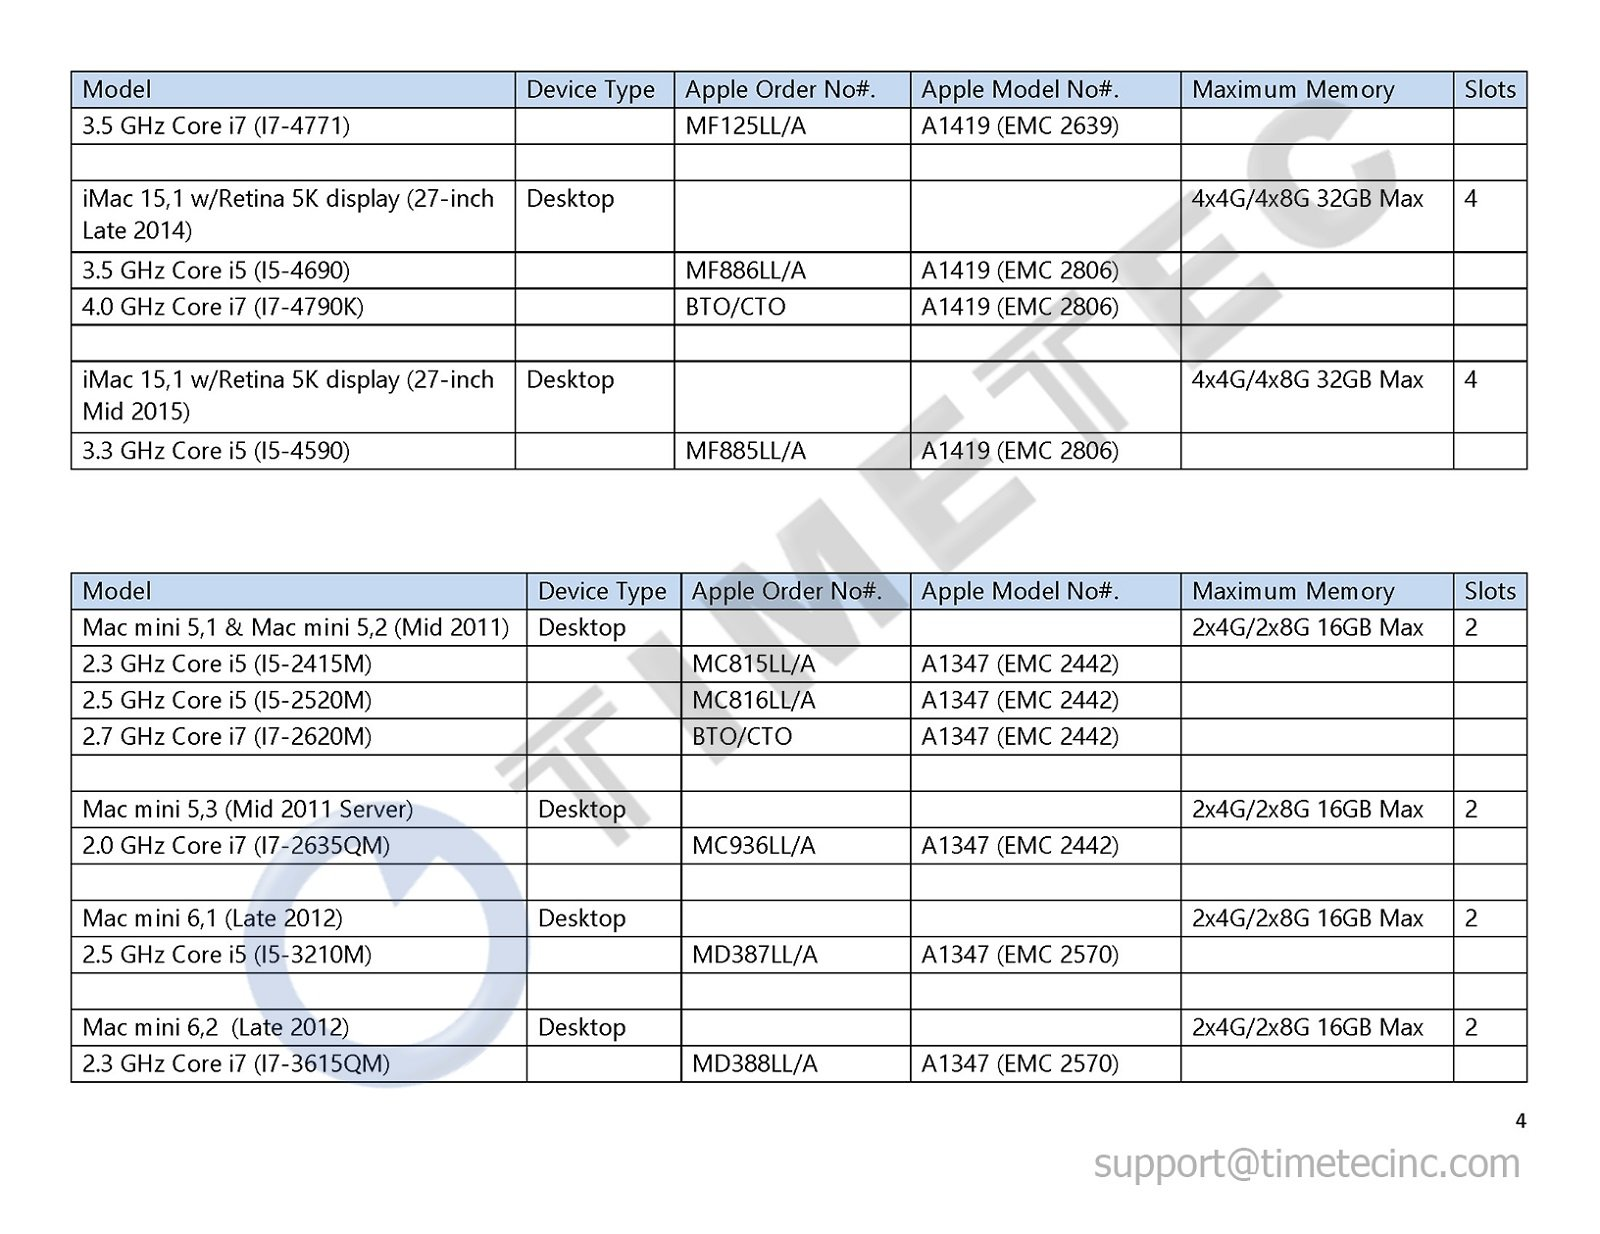 Timetec Hynix IC Apple 16GB Kit (2x8GB) DDR3L 1600MHz PC3L-12800 SODIMM Memory upgrade For MacBook Pro13-inch/15-inch Mid 2012, iMac 21.5-inch Late 2012/ Early/Late 2013(16GB Kit (2x8GB)) by Timetec (Image #5)